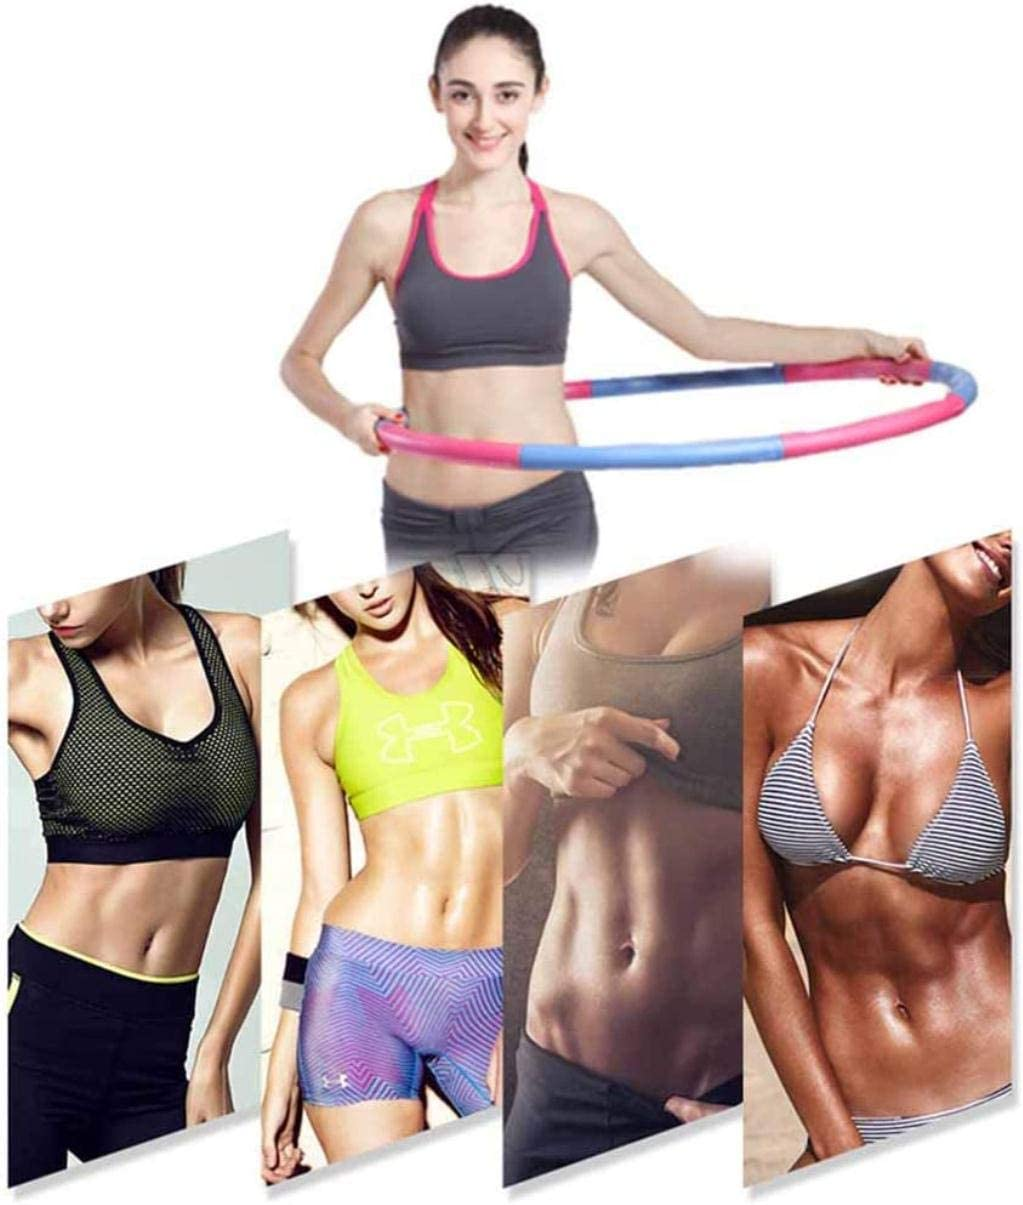 QUANOVO Die gewichteten Schaumstoff gepolstert Fitness-/Übungs-Hula Hoop Folding Fitness-Welle Weighted perfekte Weight Loss /& Fat burining Exercise Equipment